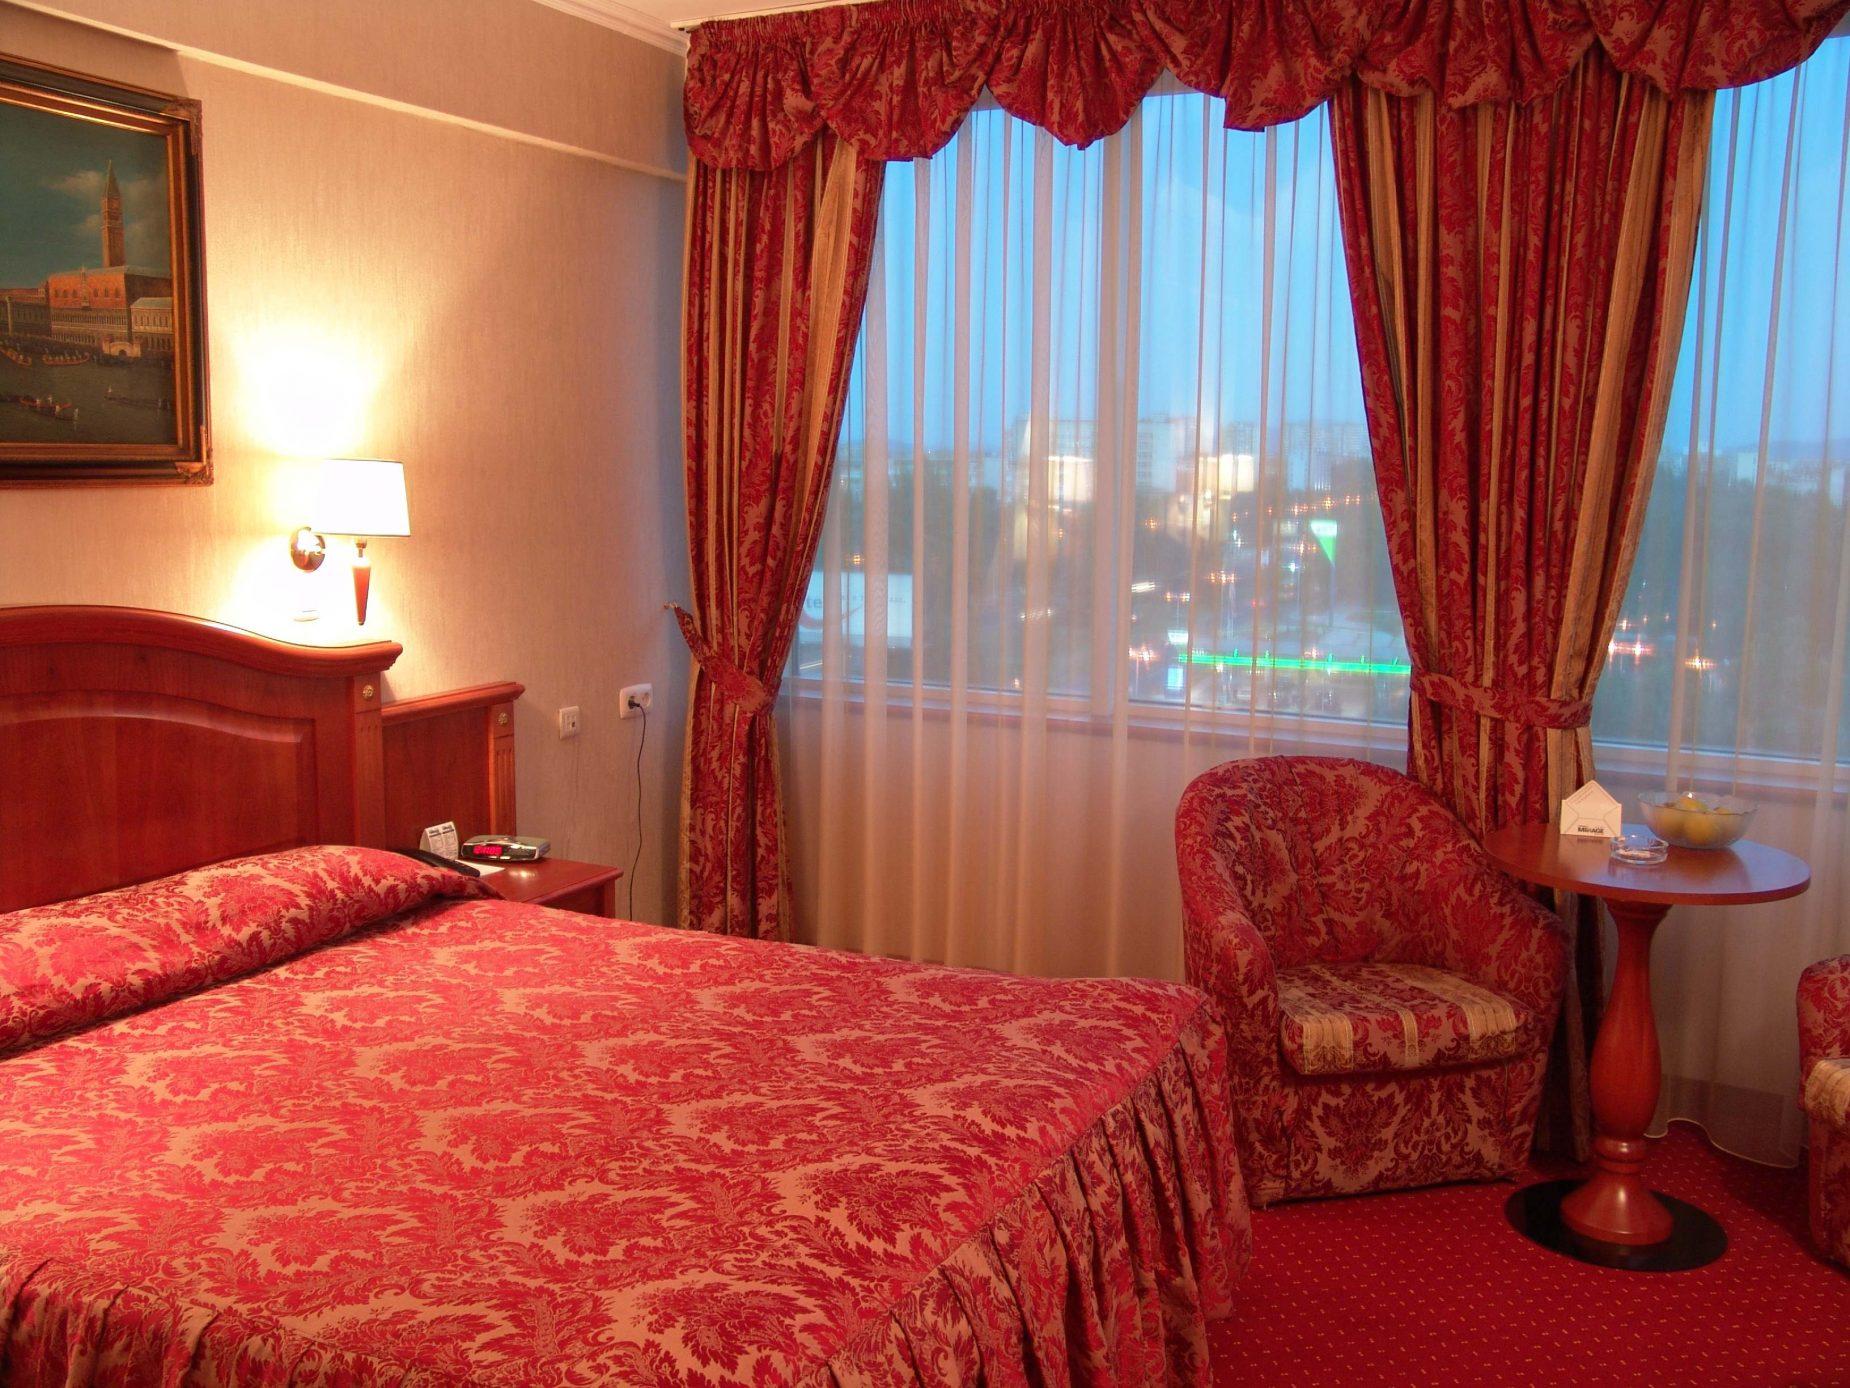 Mirage Hotel Vip Room Burgas